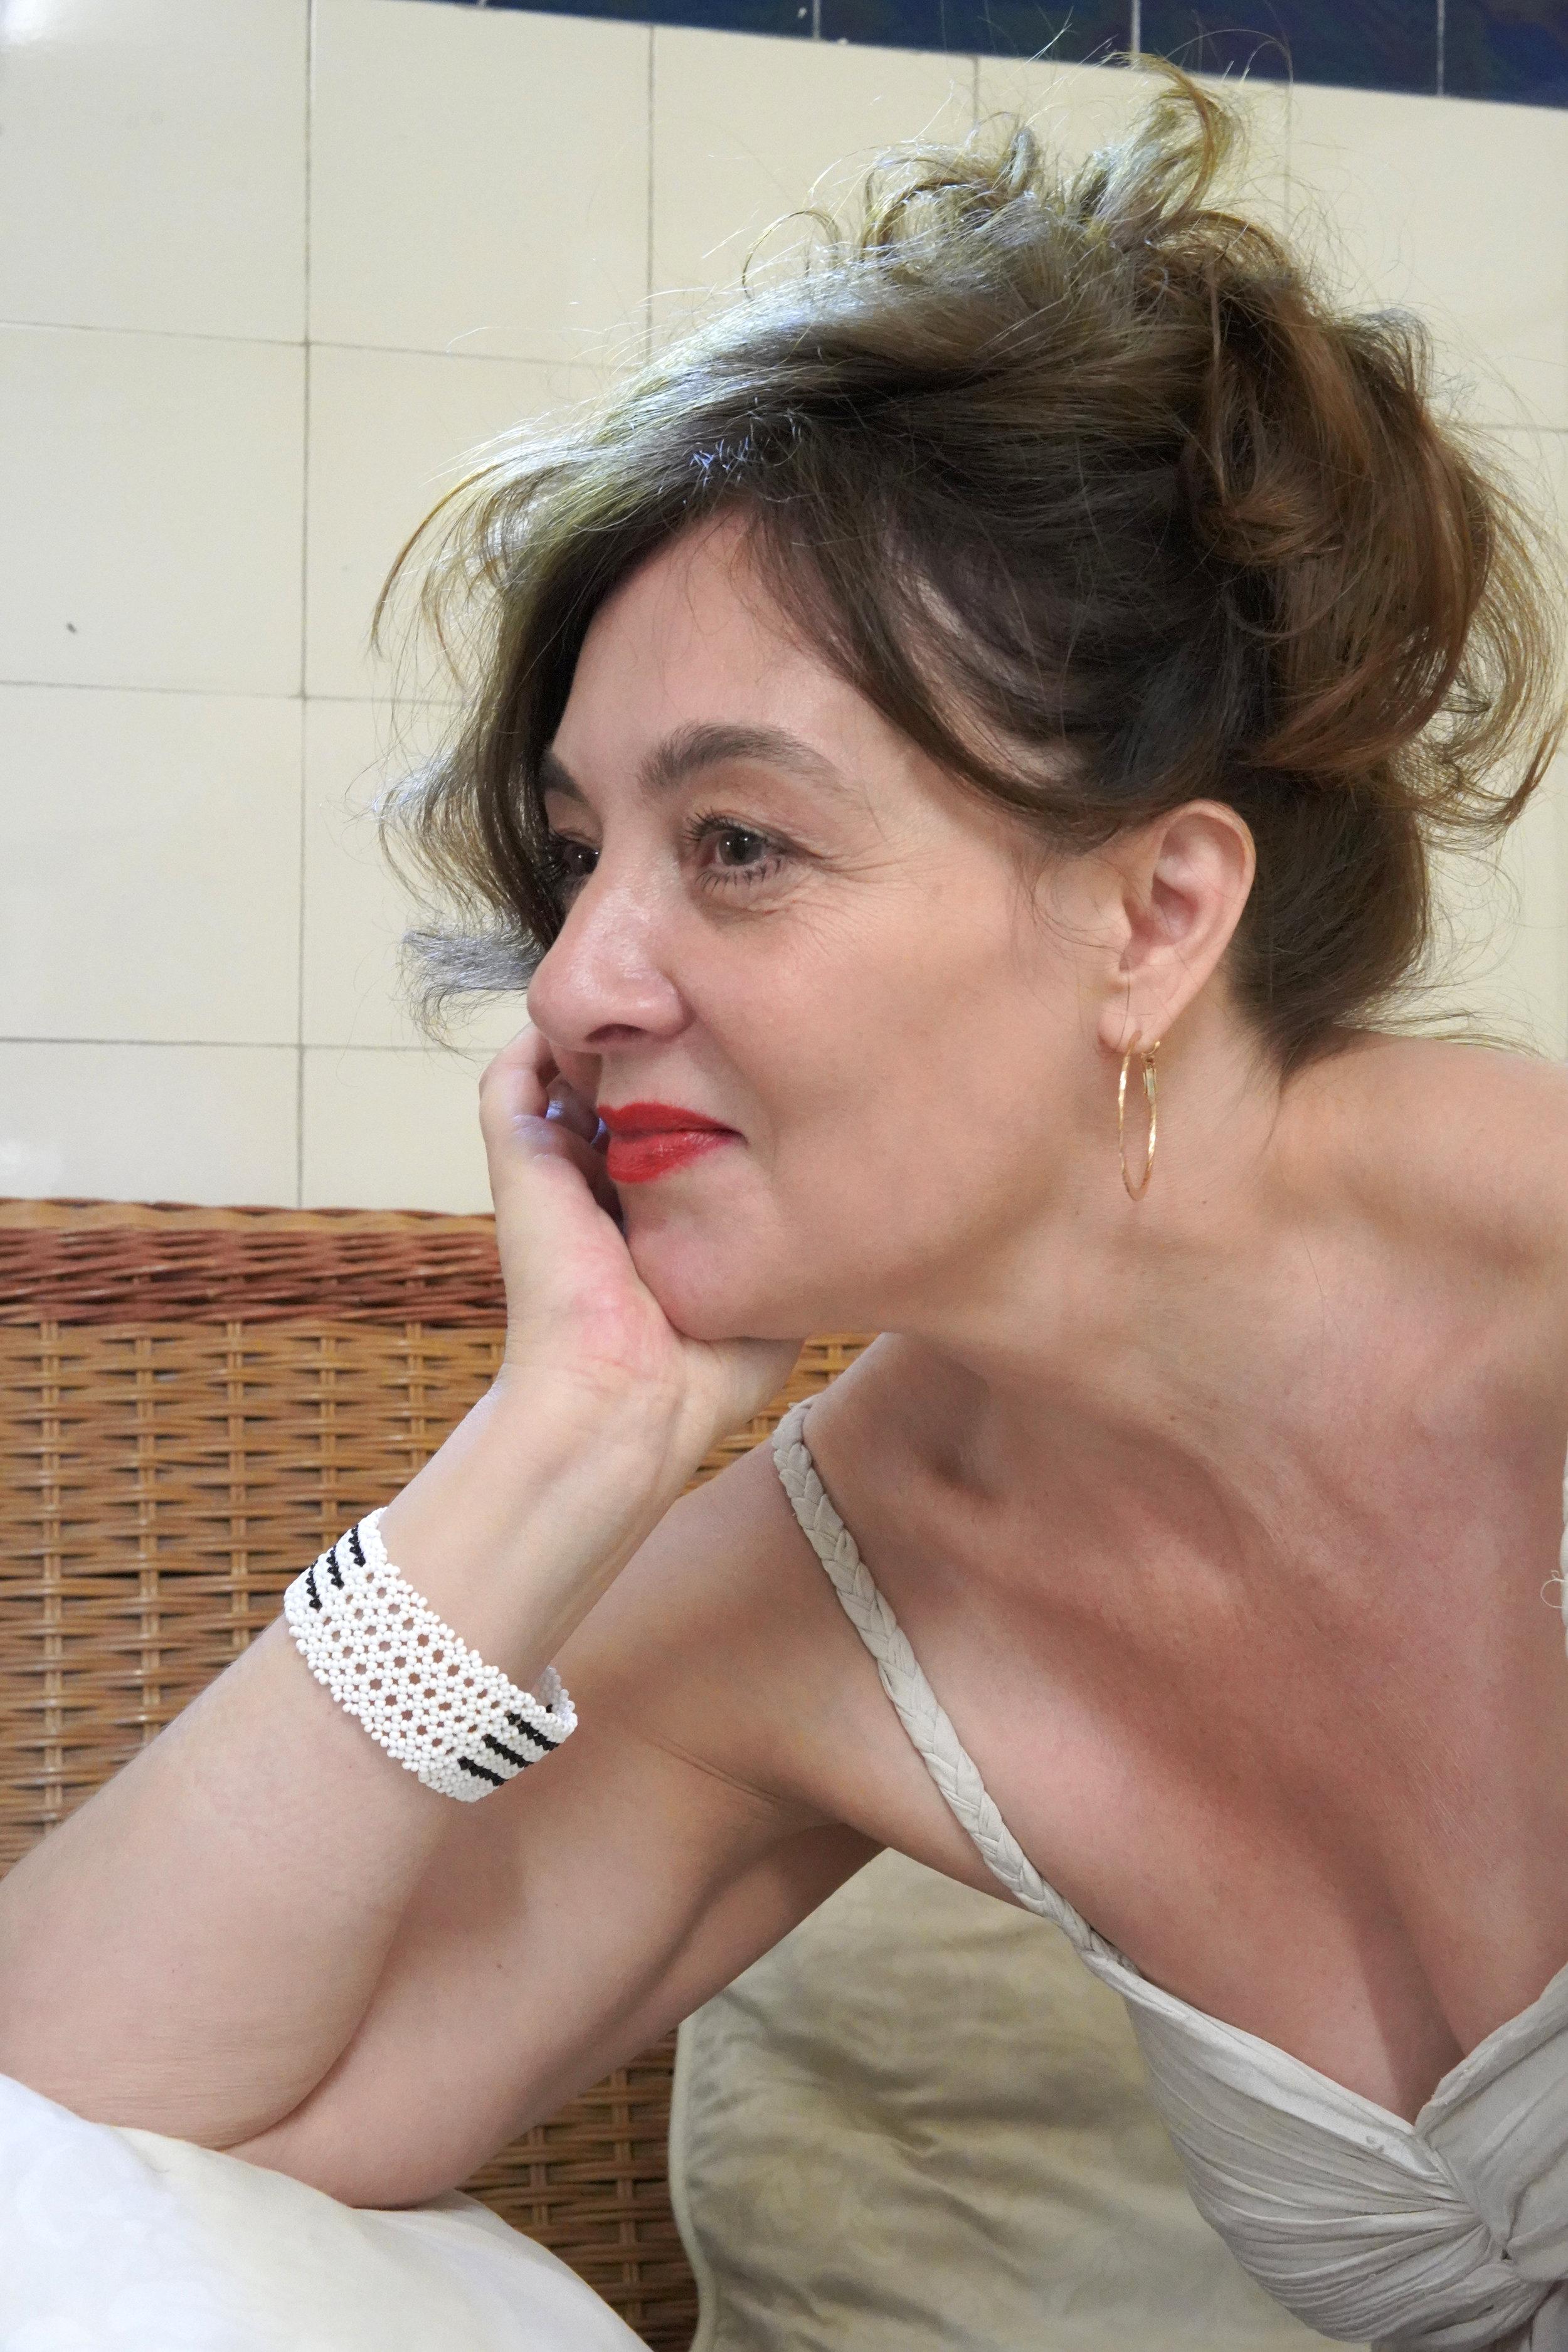 Sarah Jalabert, écrivaine et poétesse  Photo : Olga Caldas, 2018